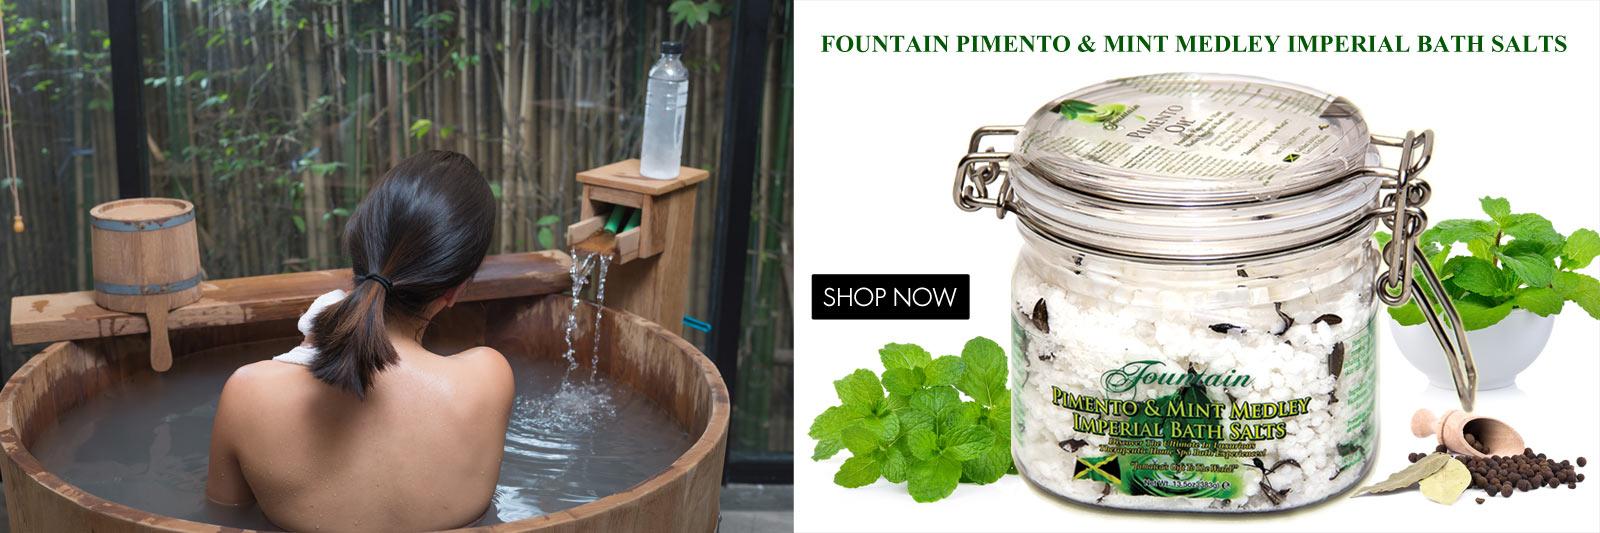 Fountain Pimento & Mint Medley Bath Salts